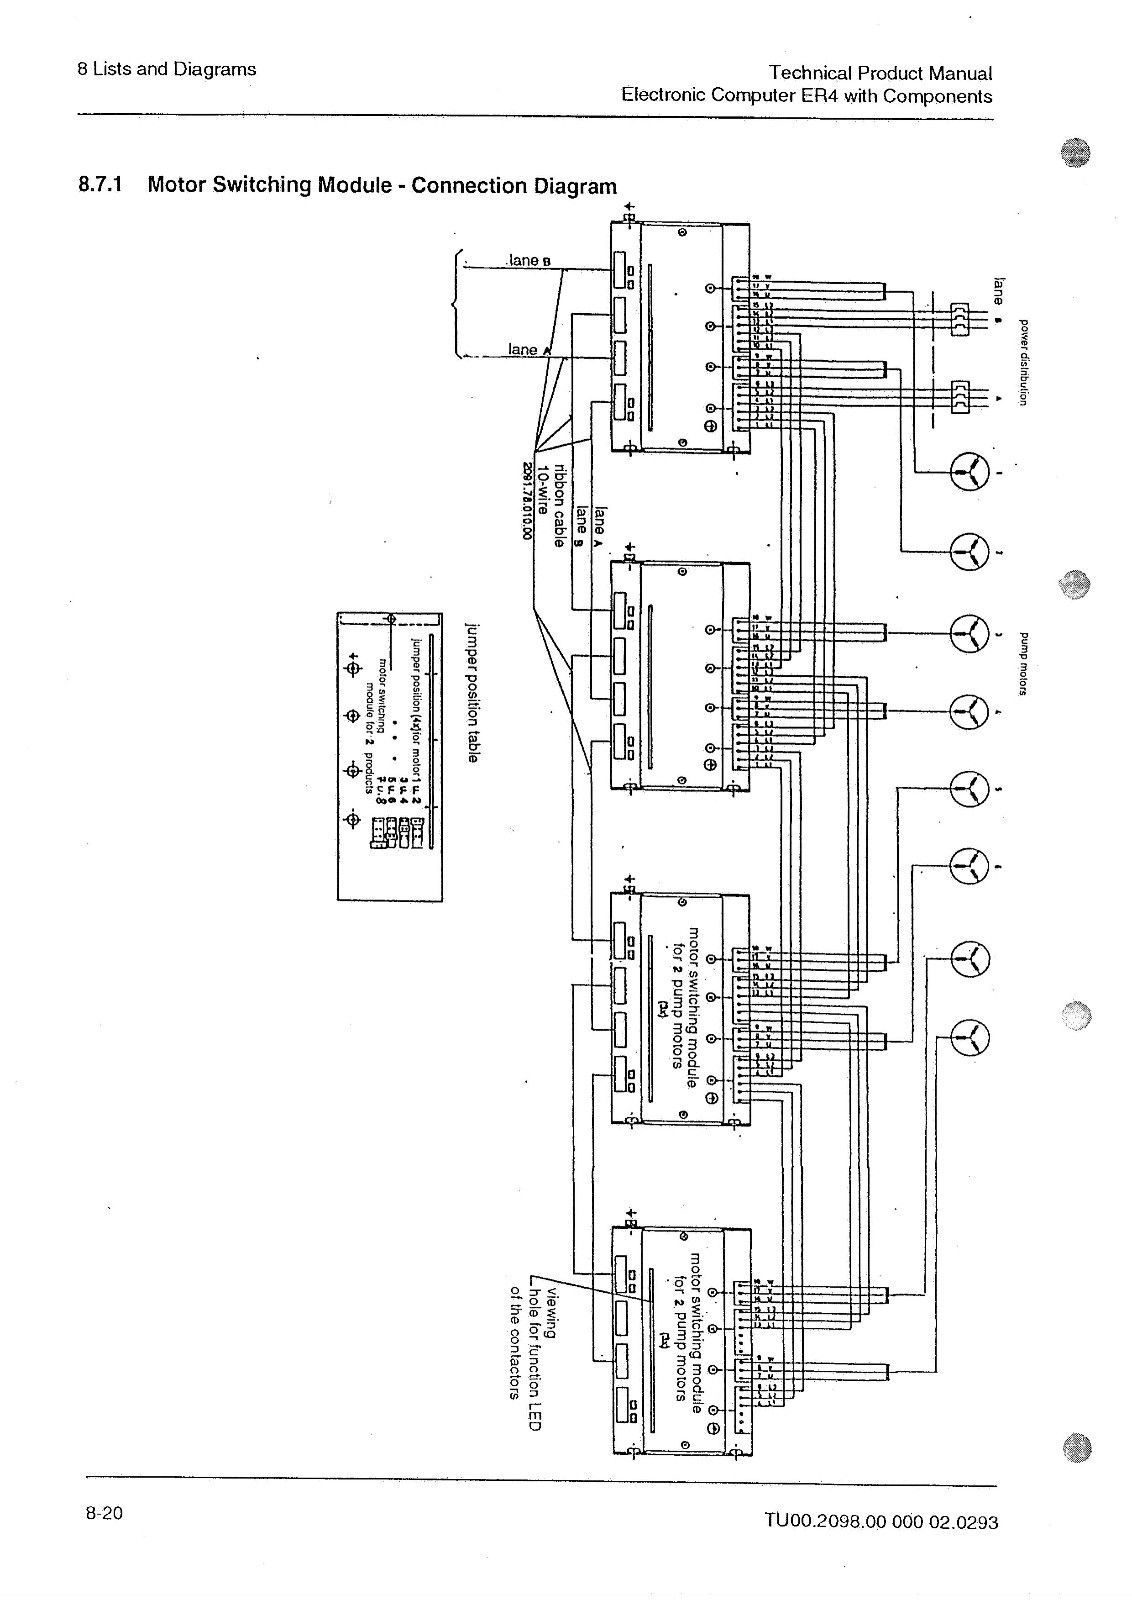 wein bridge oscillator circuit diagram 06 dodge ram radio wiring s4s pontiac grand am v6 engine 03